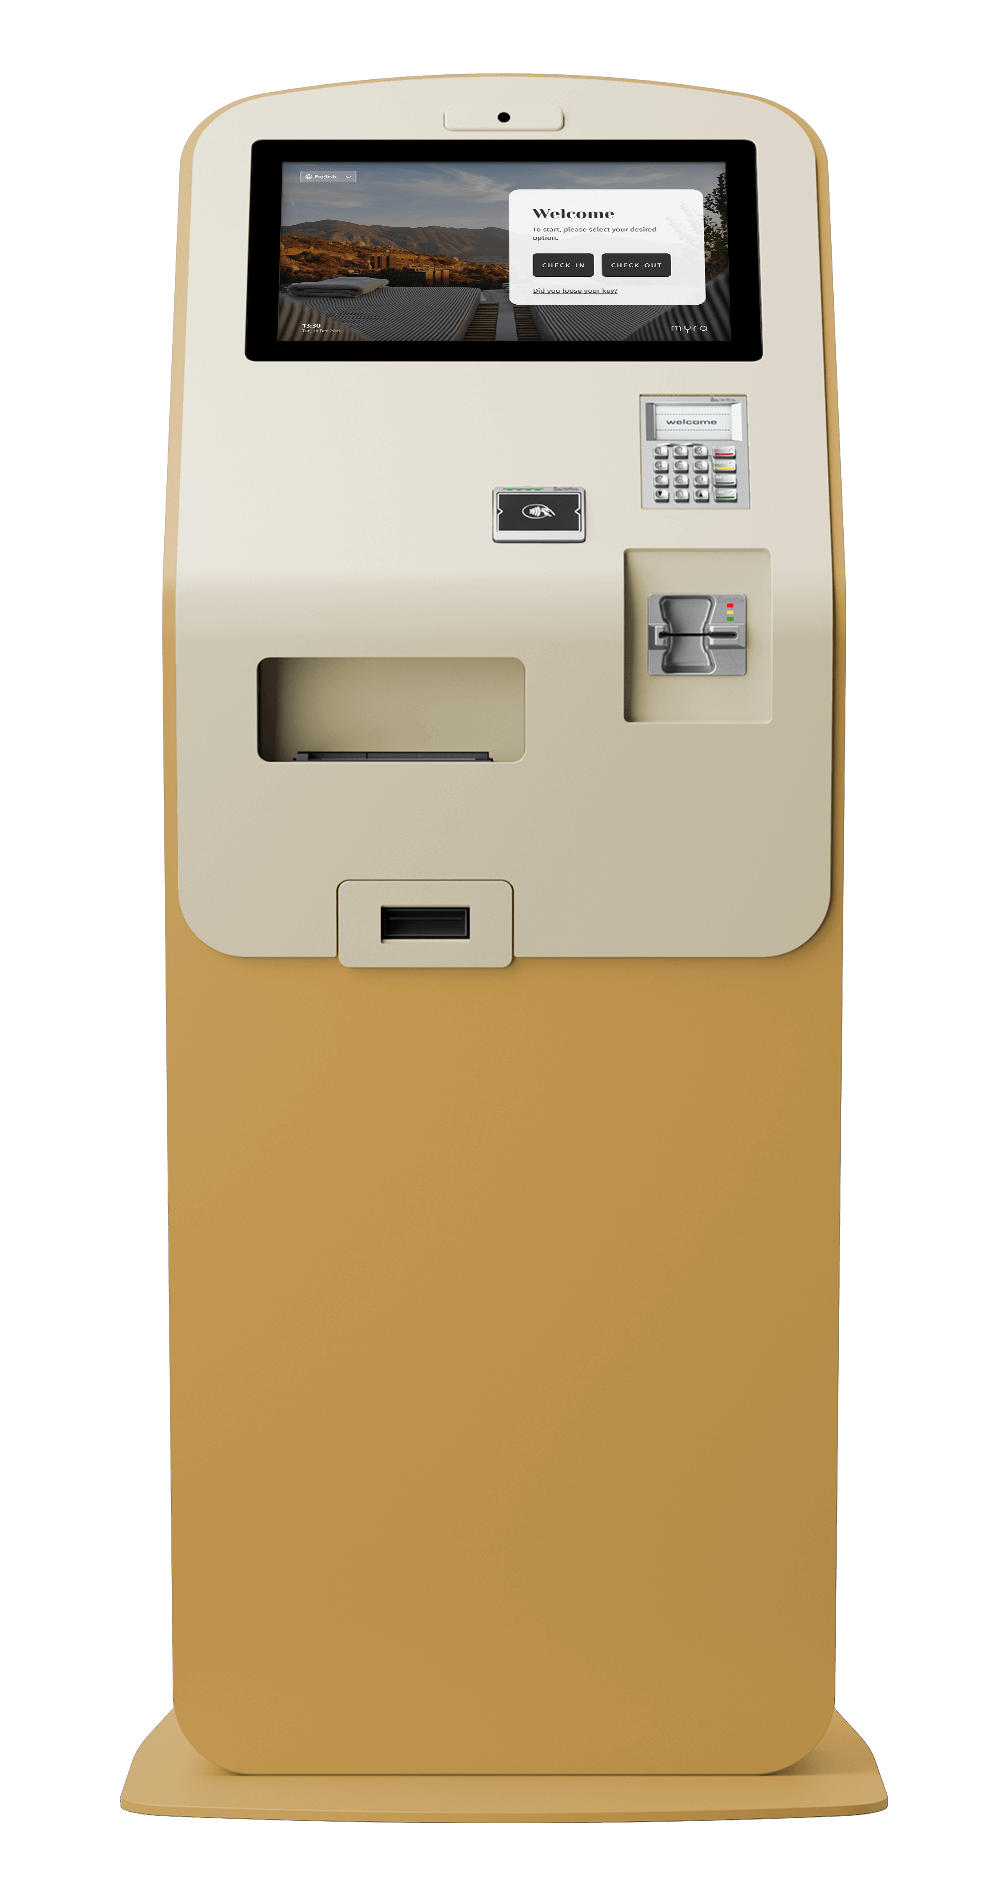 myra-check-in-kiosk-frontal-yellow